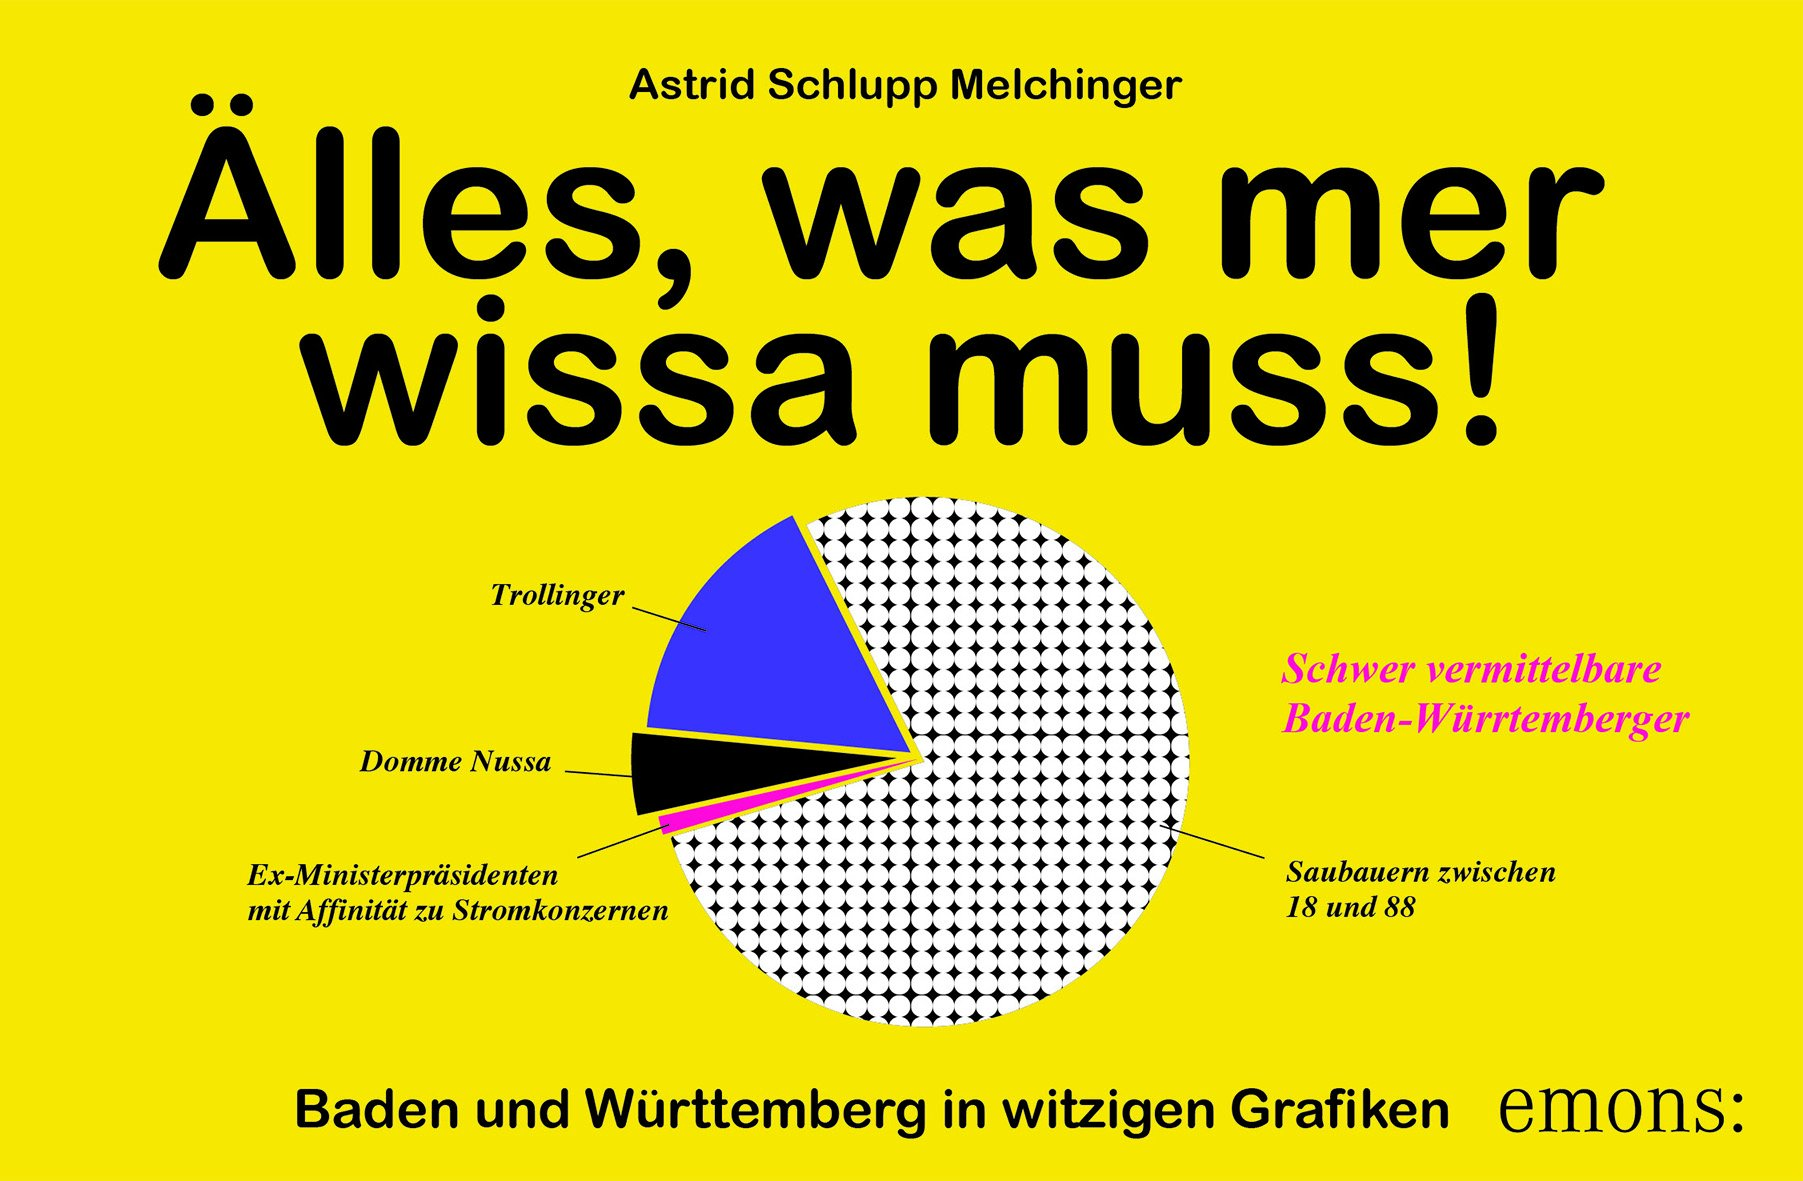 NEU Älles, was mer wissa muss! Astrid Schlupp-Melchinger 519064